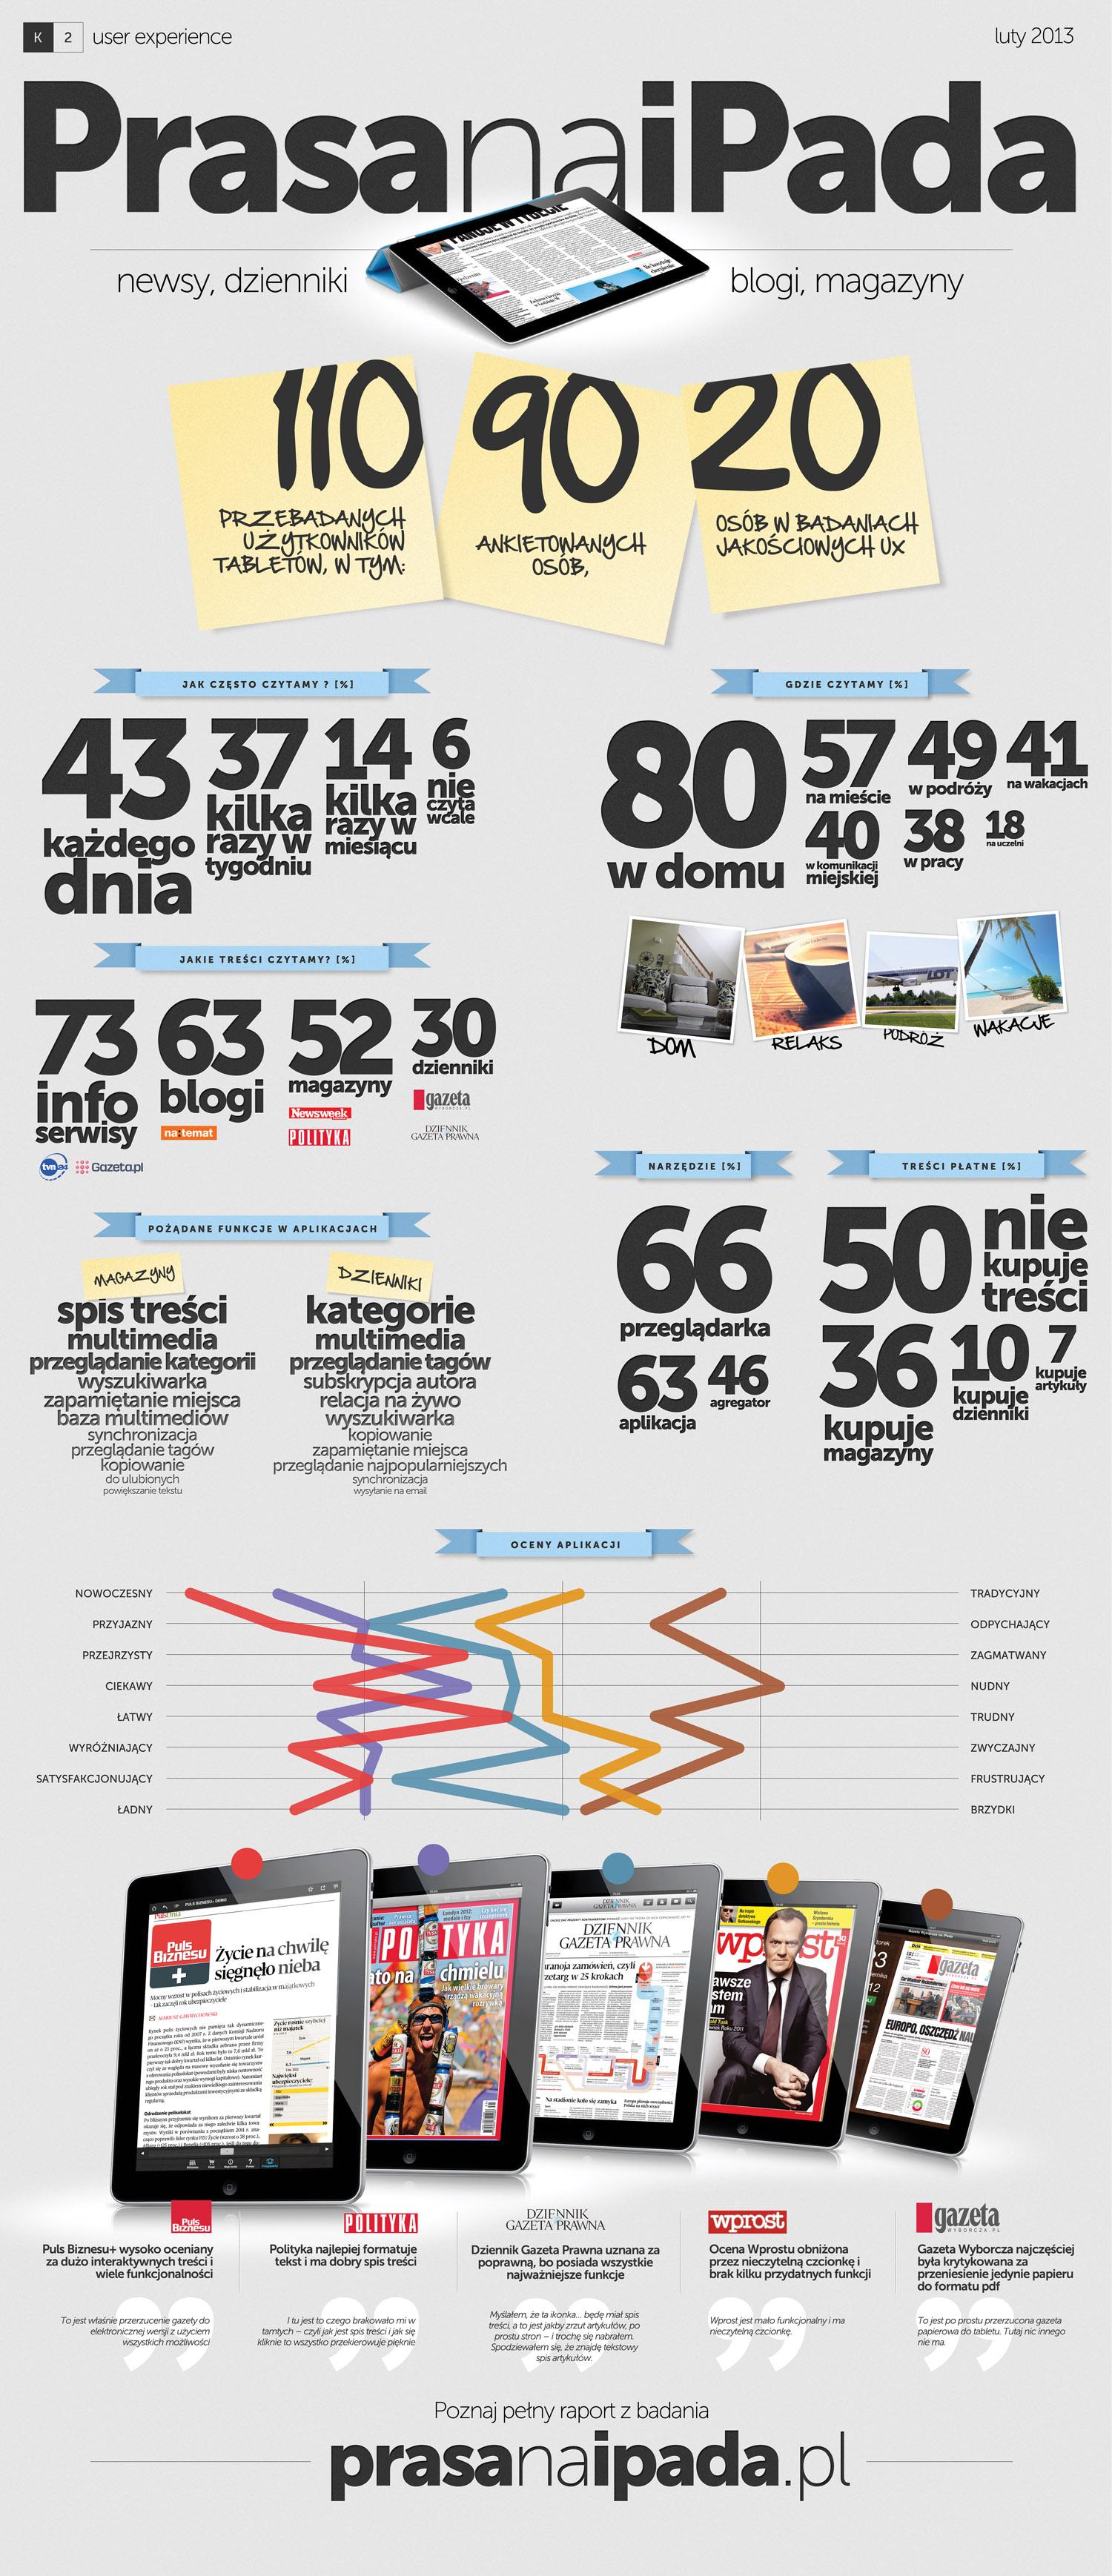 eprasa-ipad-infografika-aplikacje-mobilne